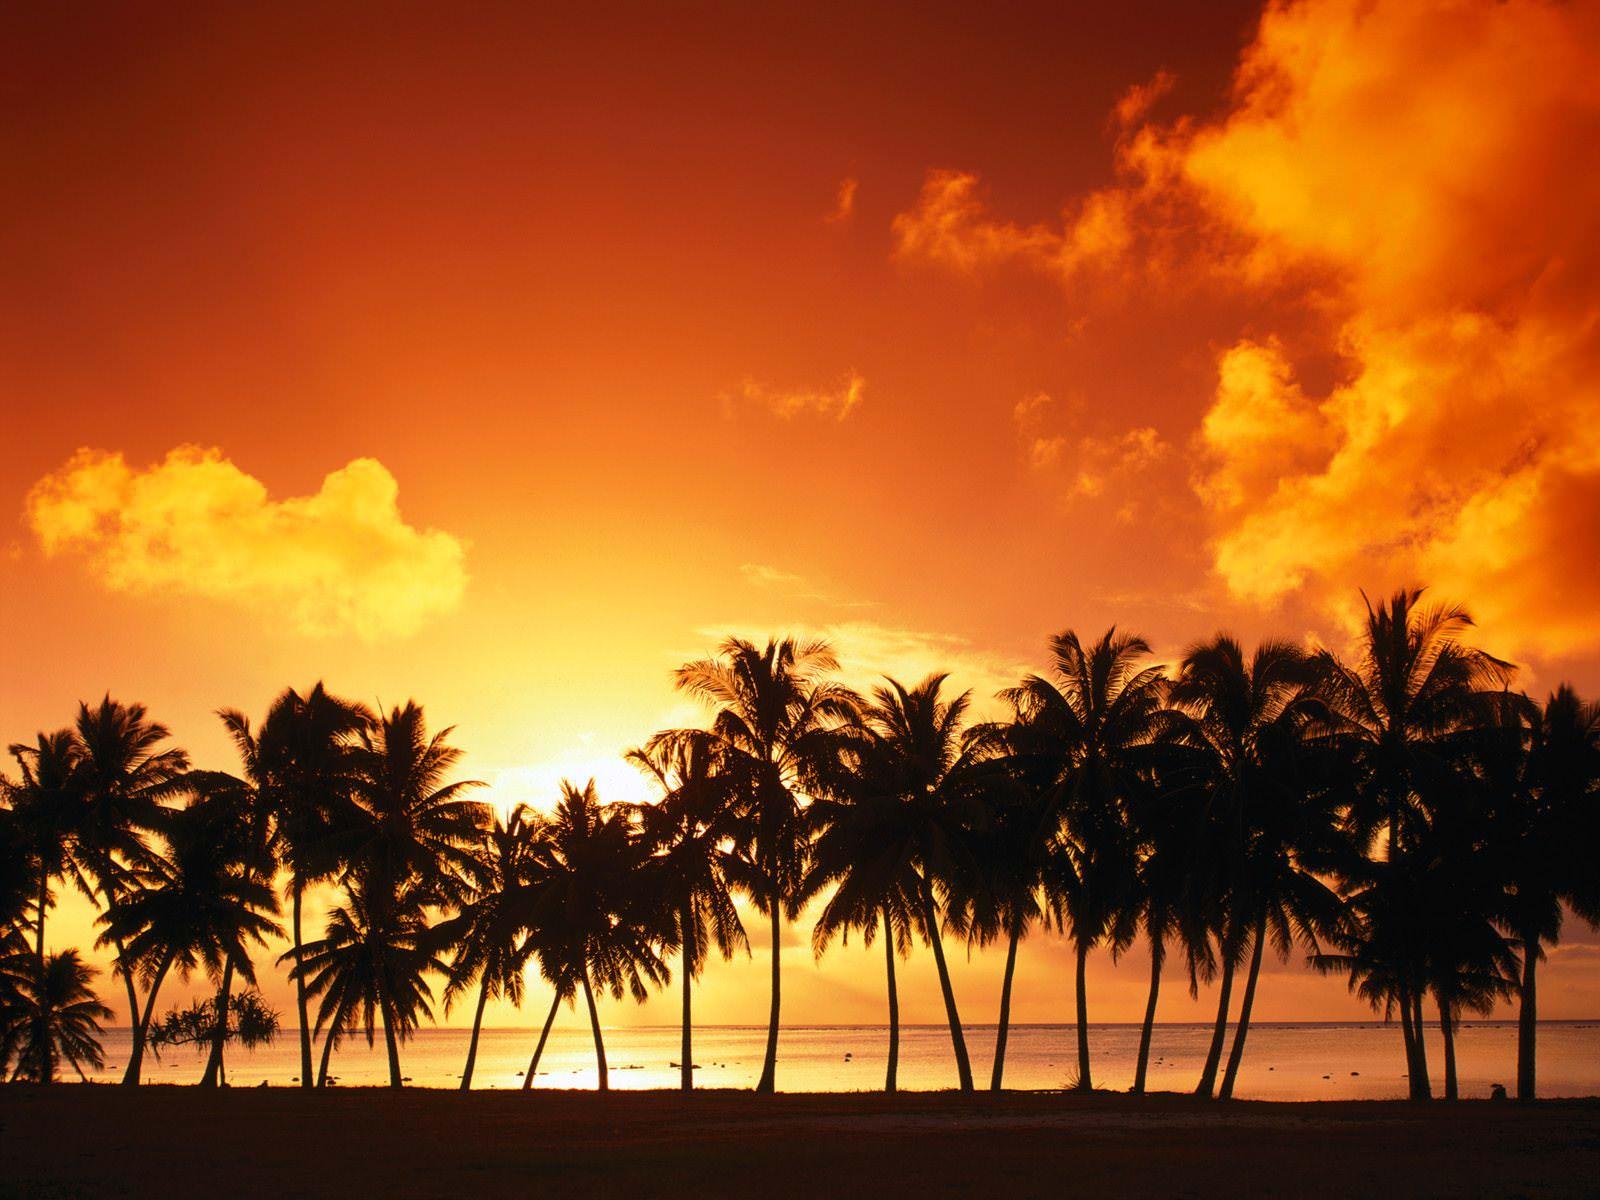 Aitutaki Island at Sunset Wallpaper